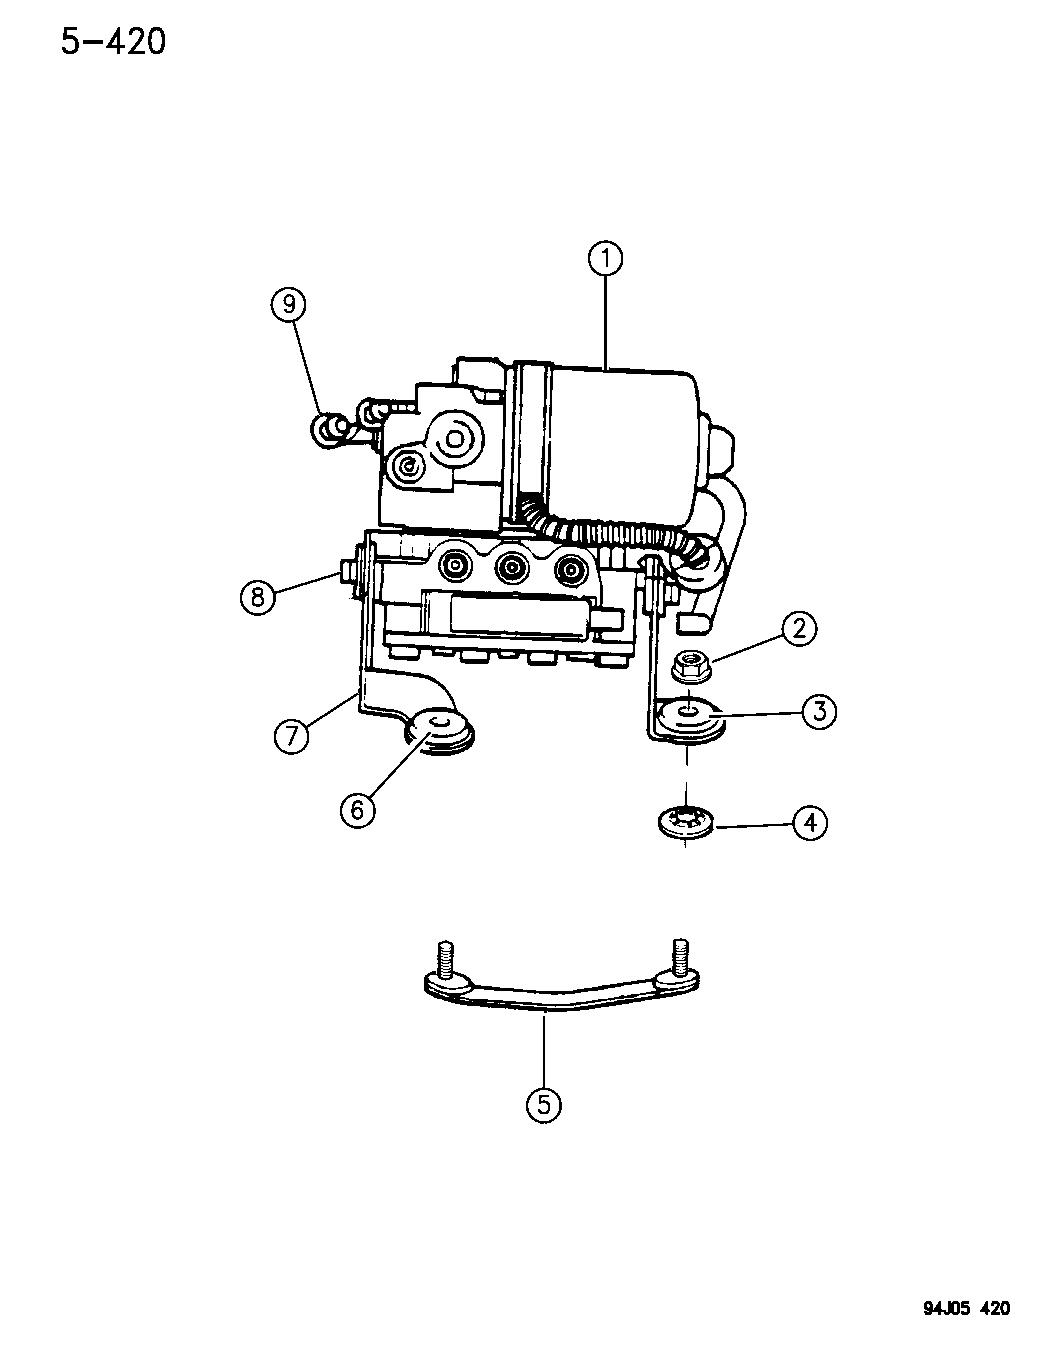 1996 Jeep Grand Cherokee Hydraulic Control Unit Anti-Lock